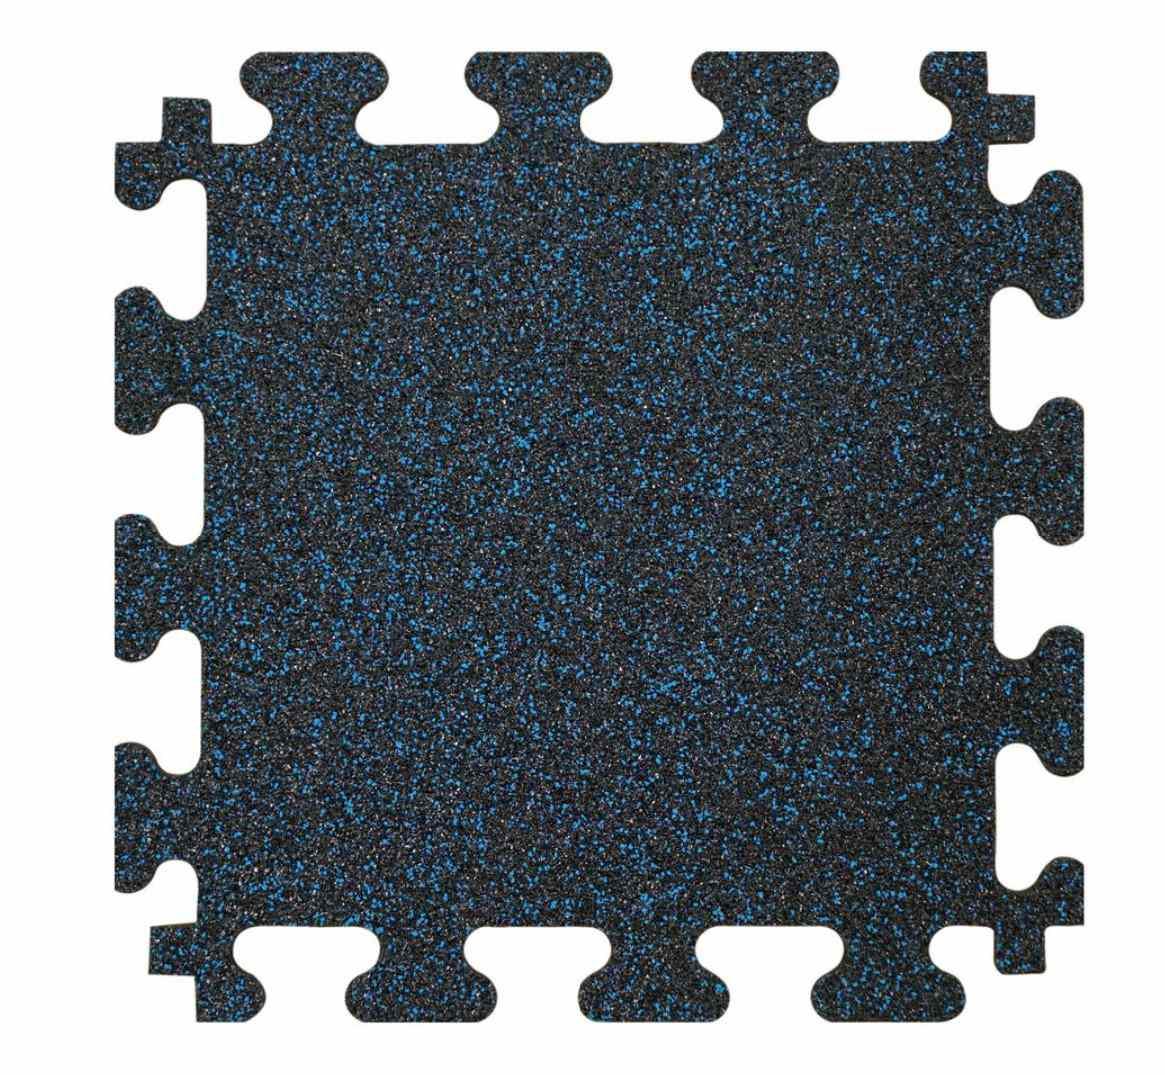 TrafficMaster Rubber Gym Flooring Tiles